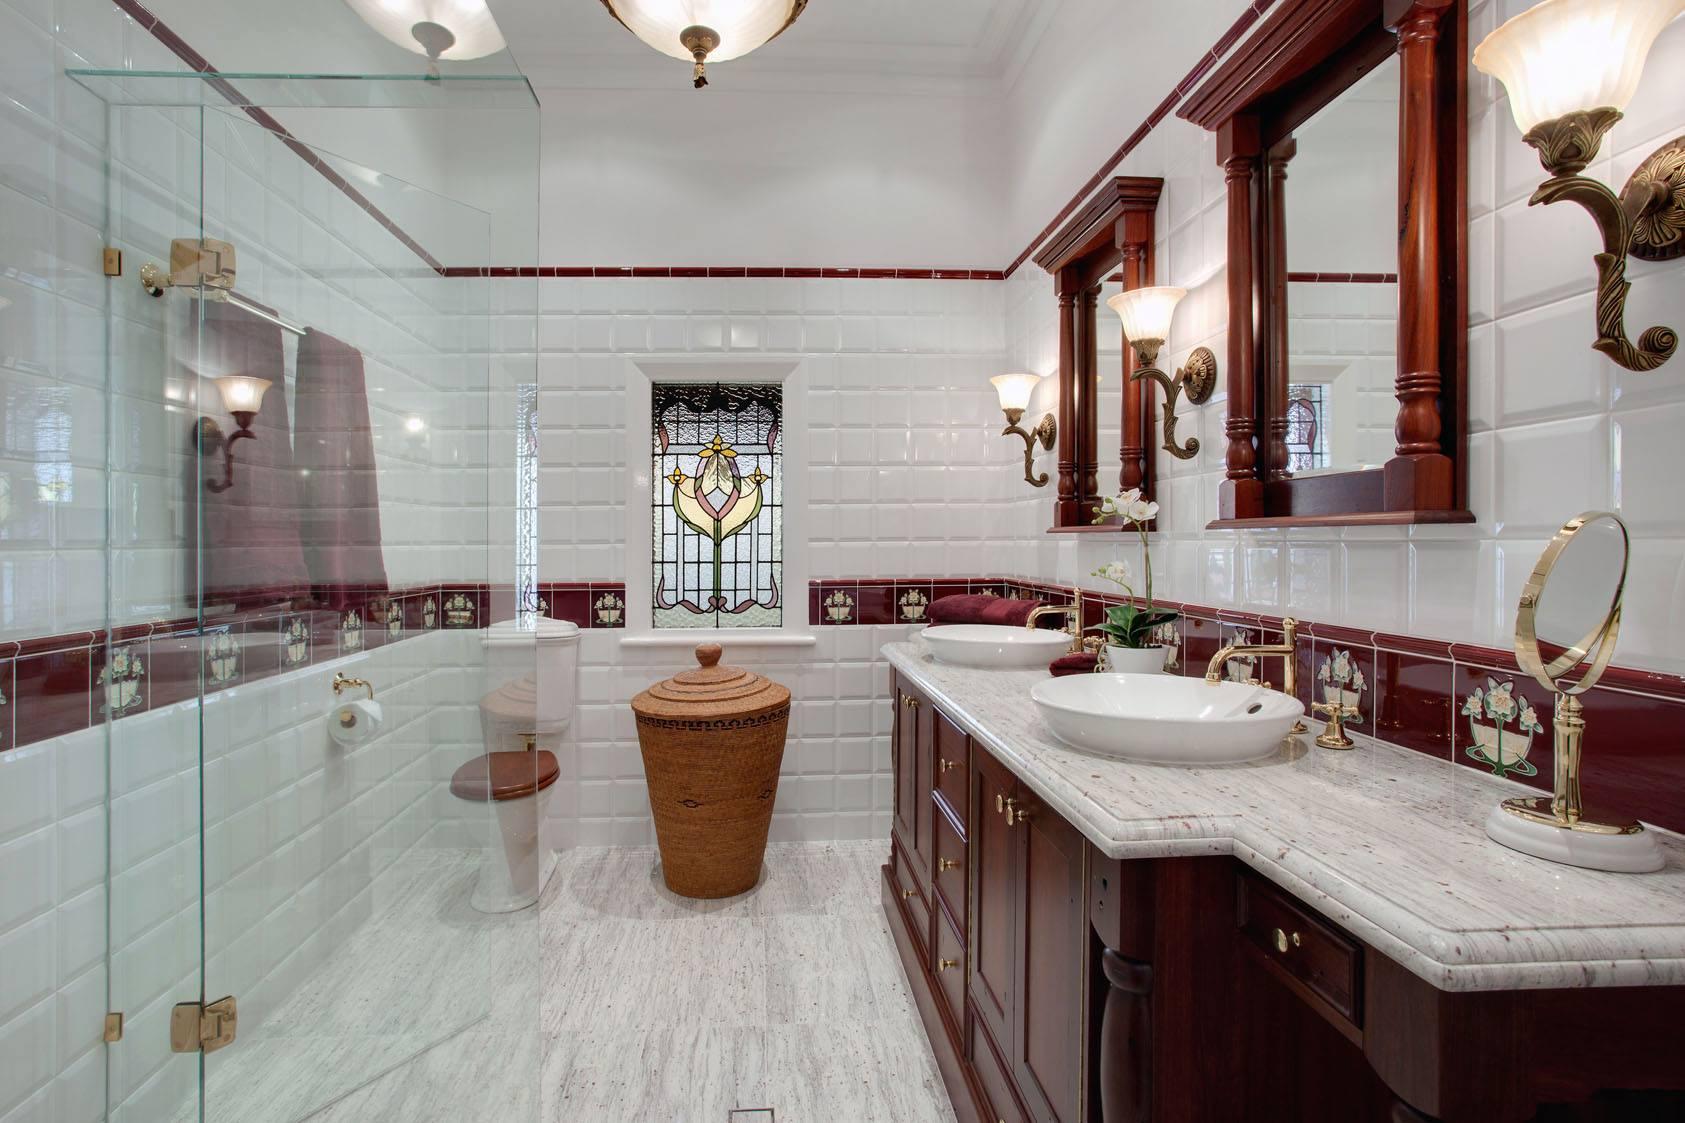 Bathroom Renovations Campbelltown | Modern & Vintage